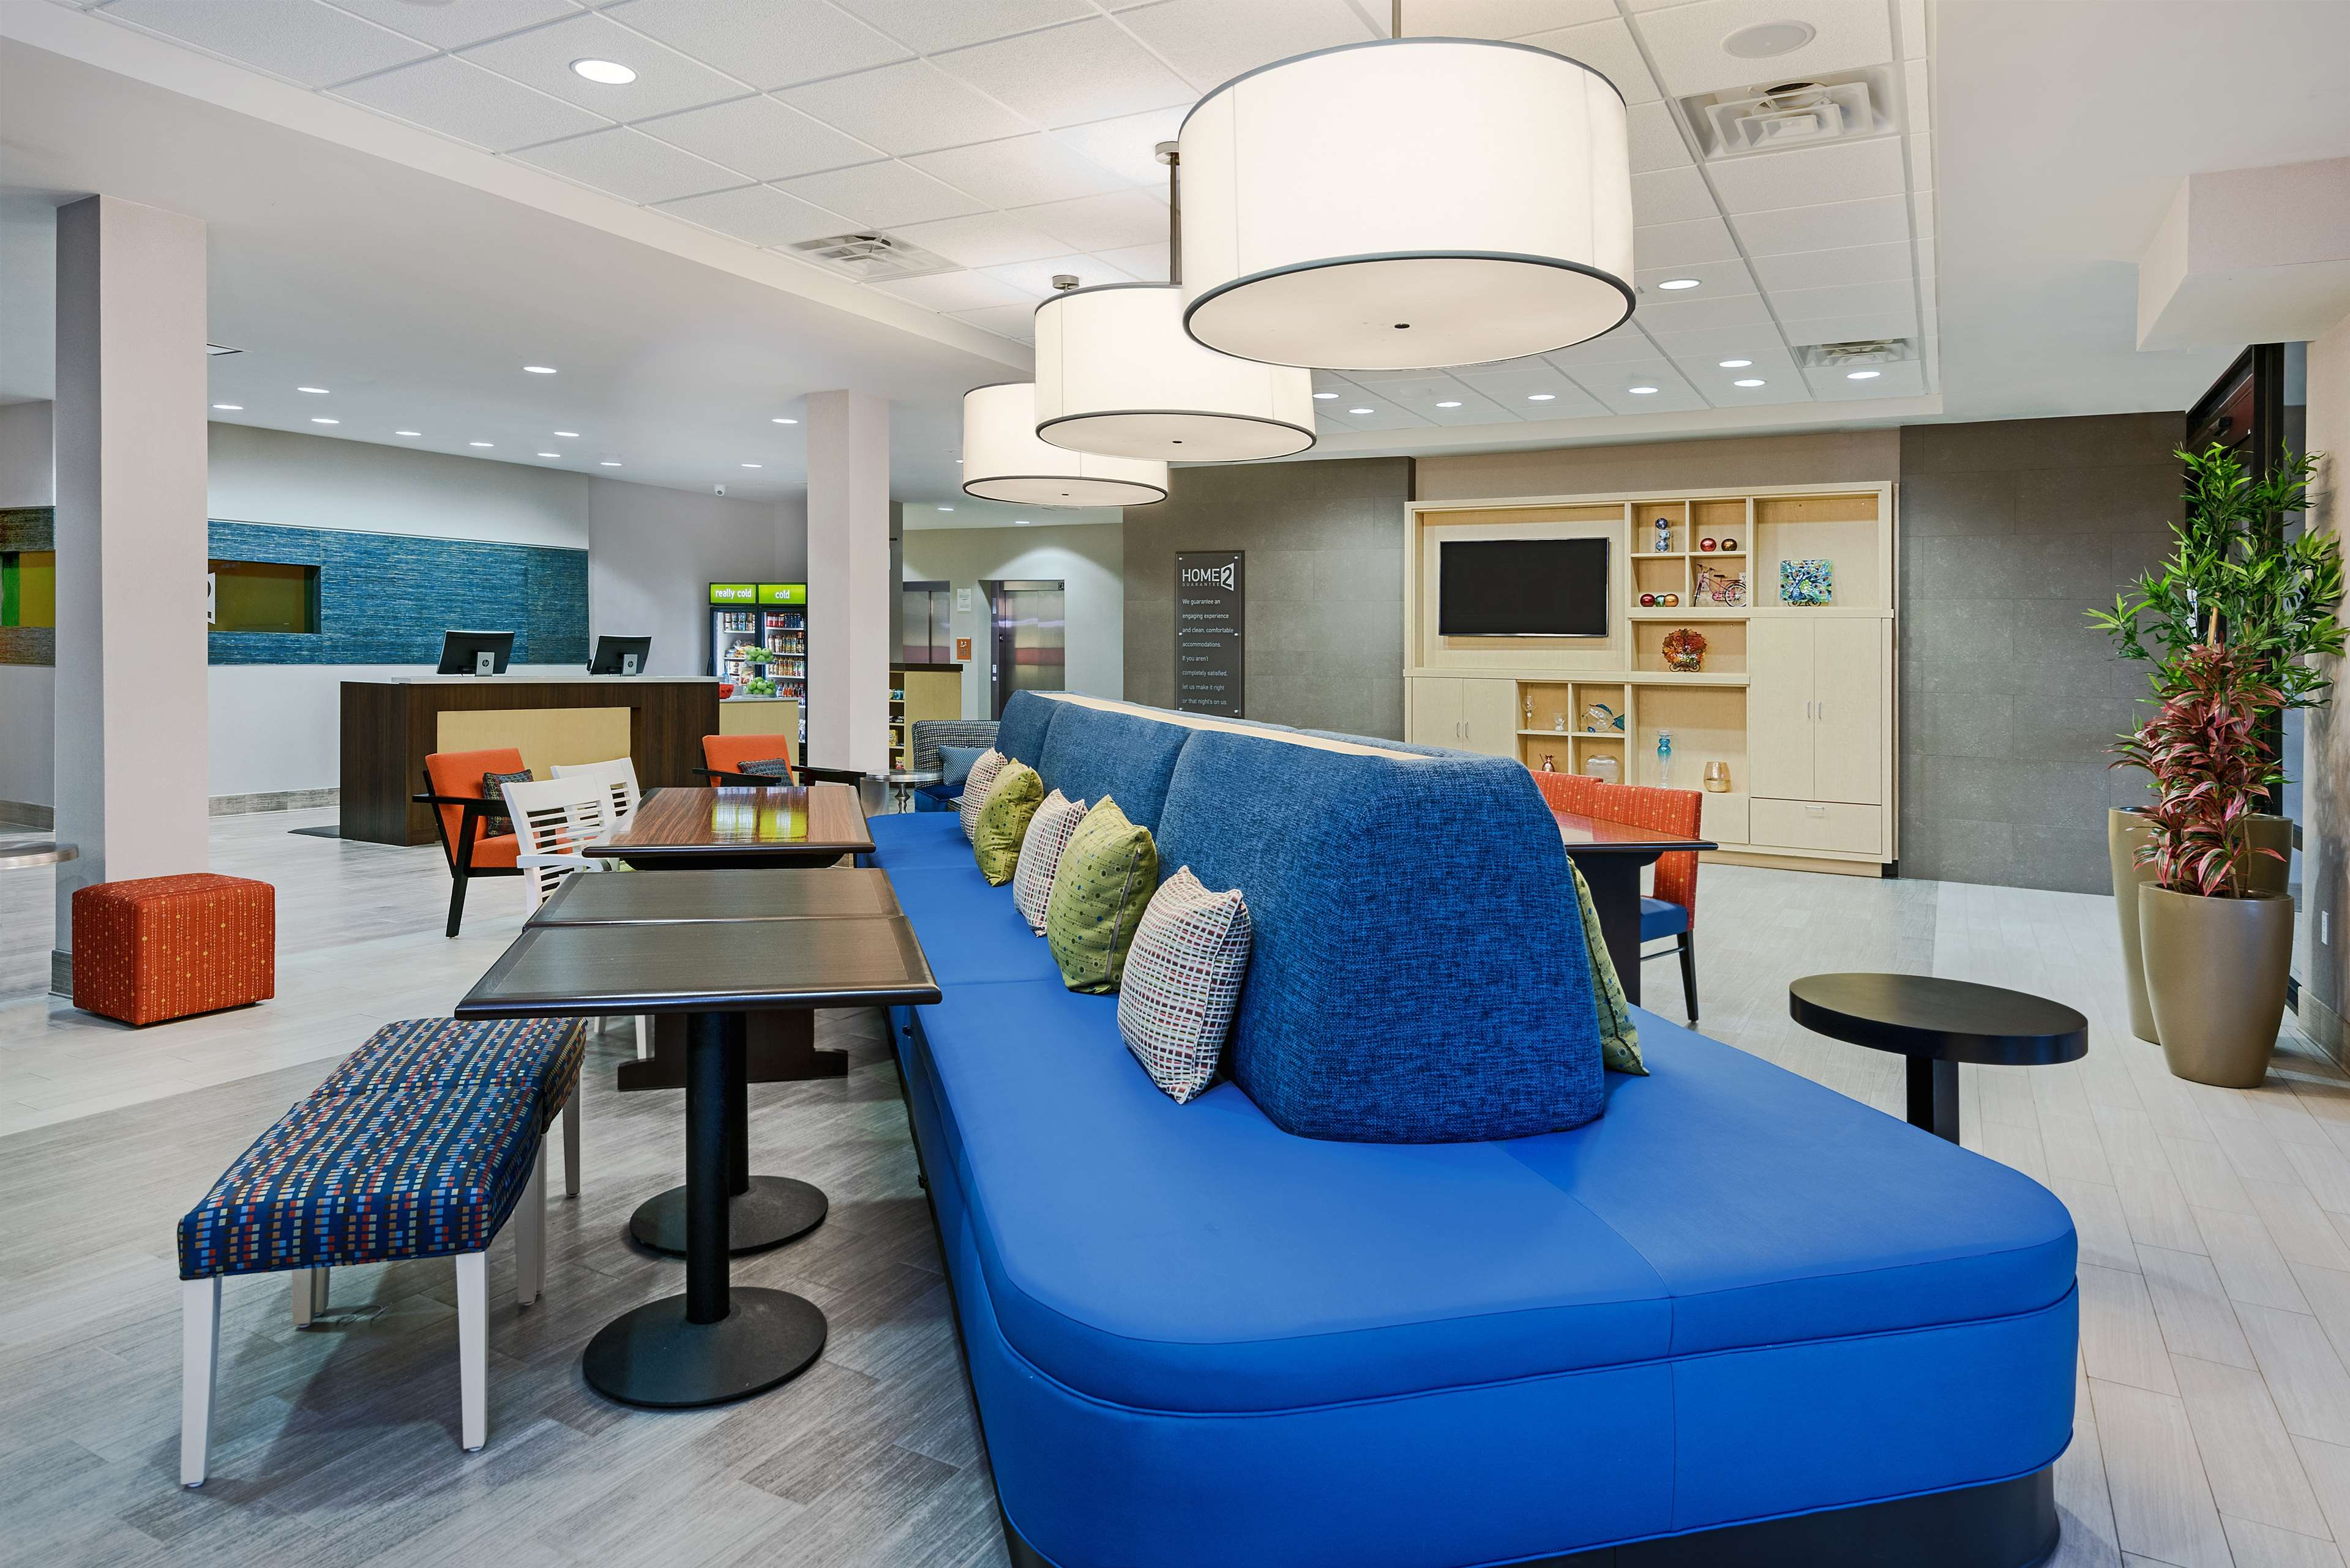 Home2 Suites by Hilton Austin Airport image 4